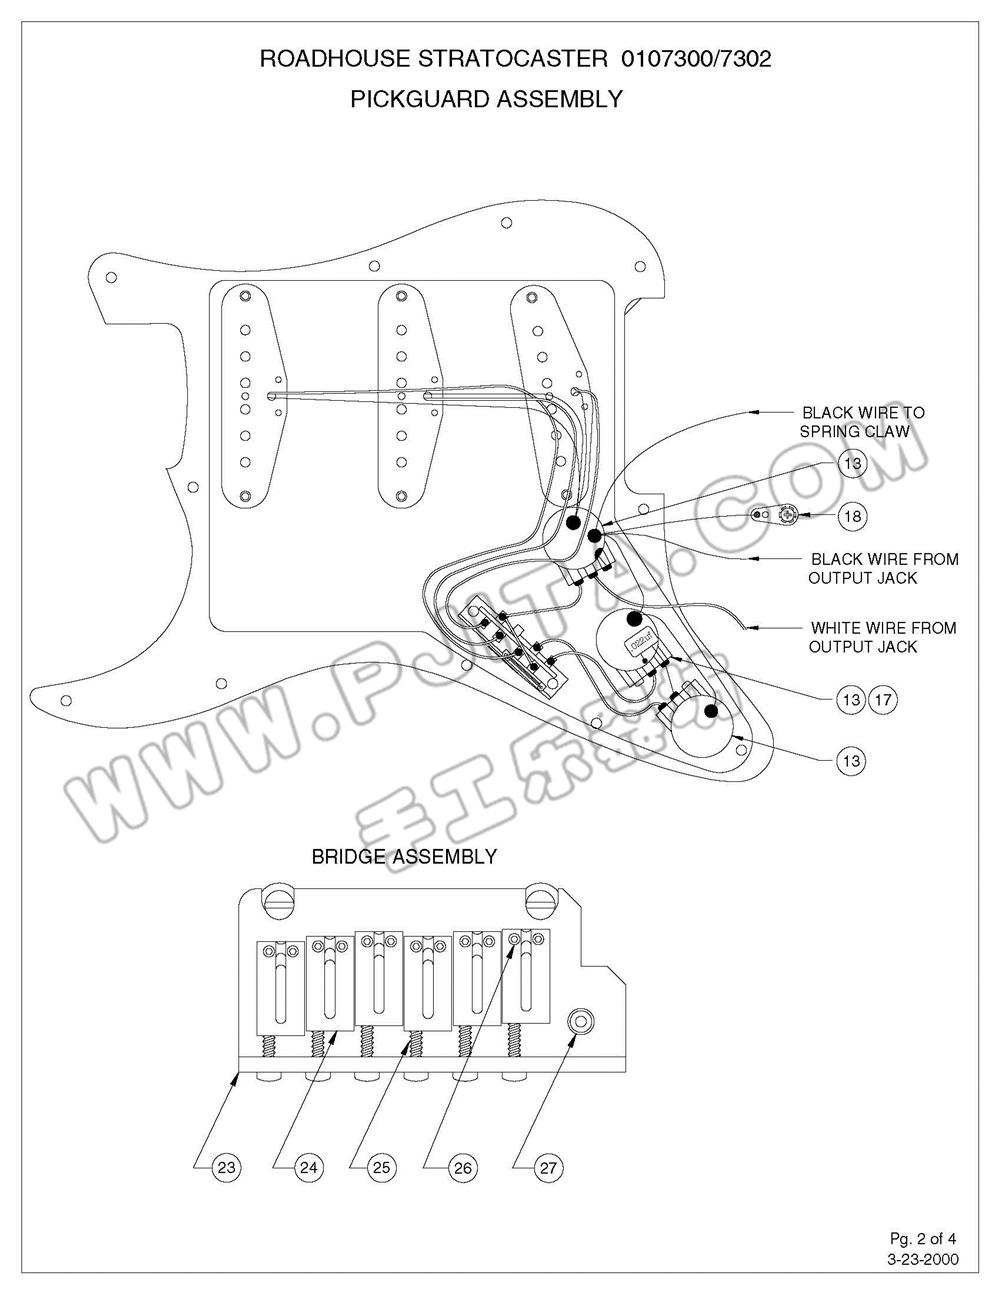 fender usa 010 系列 stratocaster 电路图最全集合之